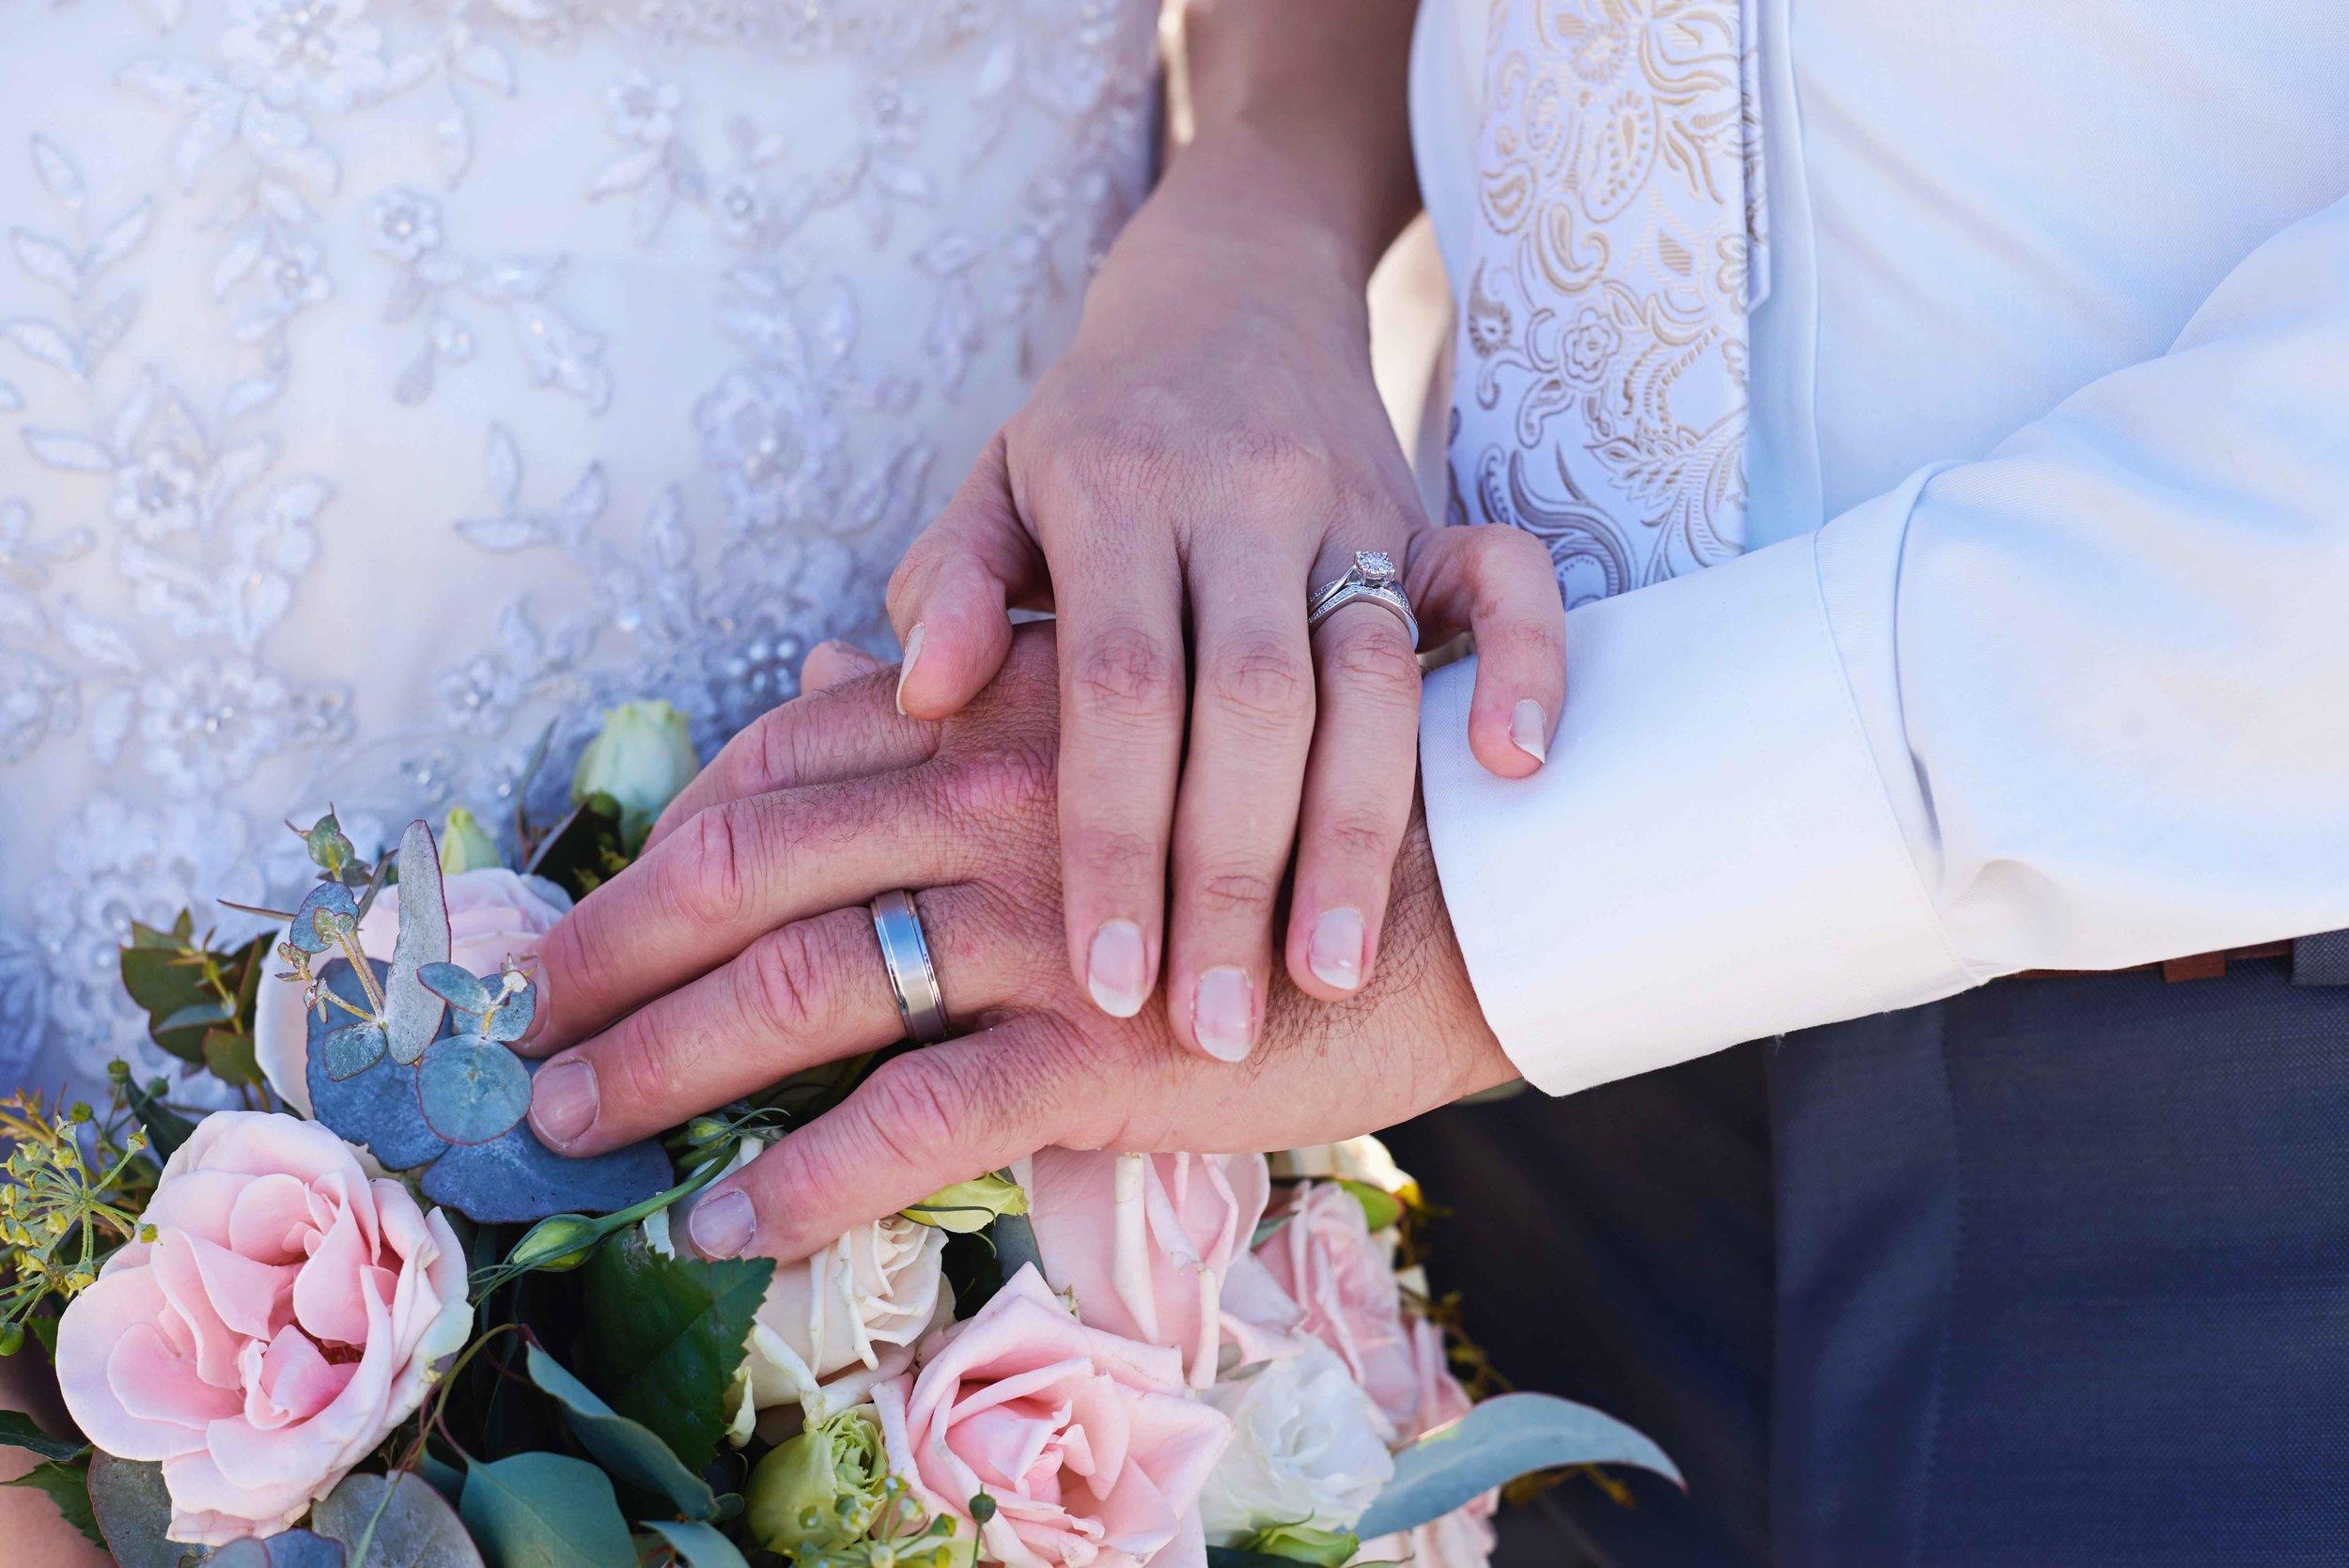 sorrento-wedding-photography-all-smiles-marissa-jade-photography-164.jpg